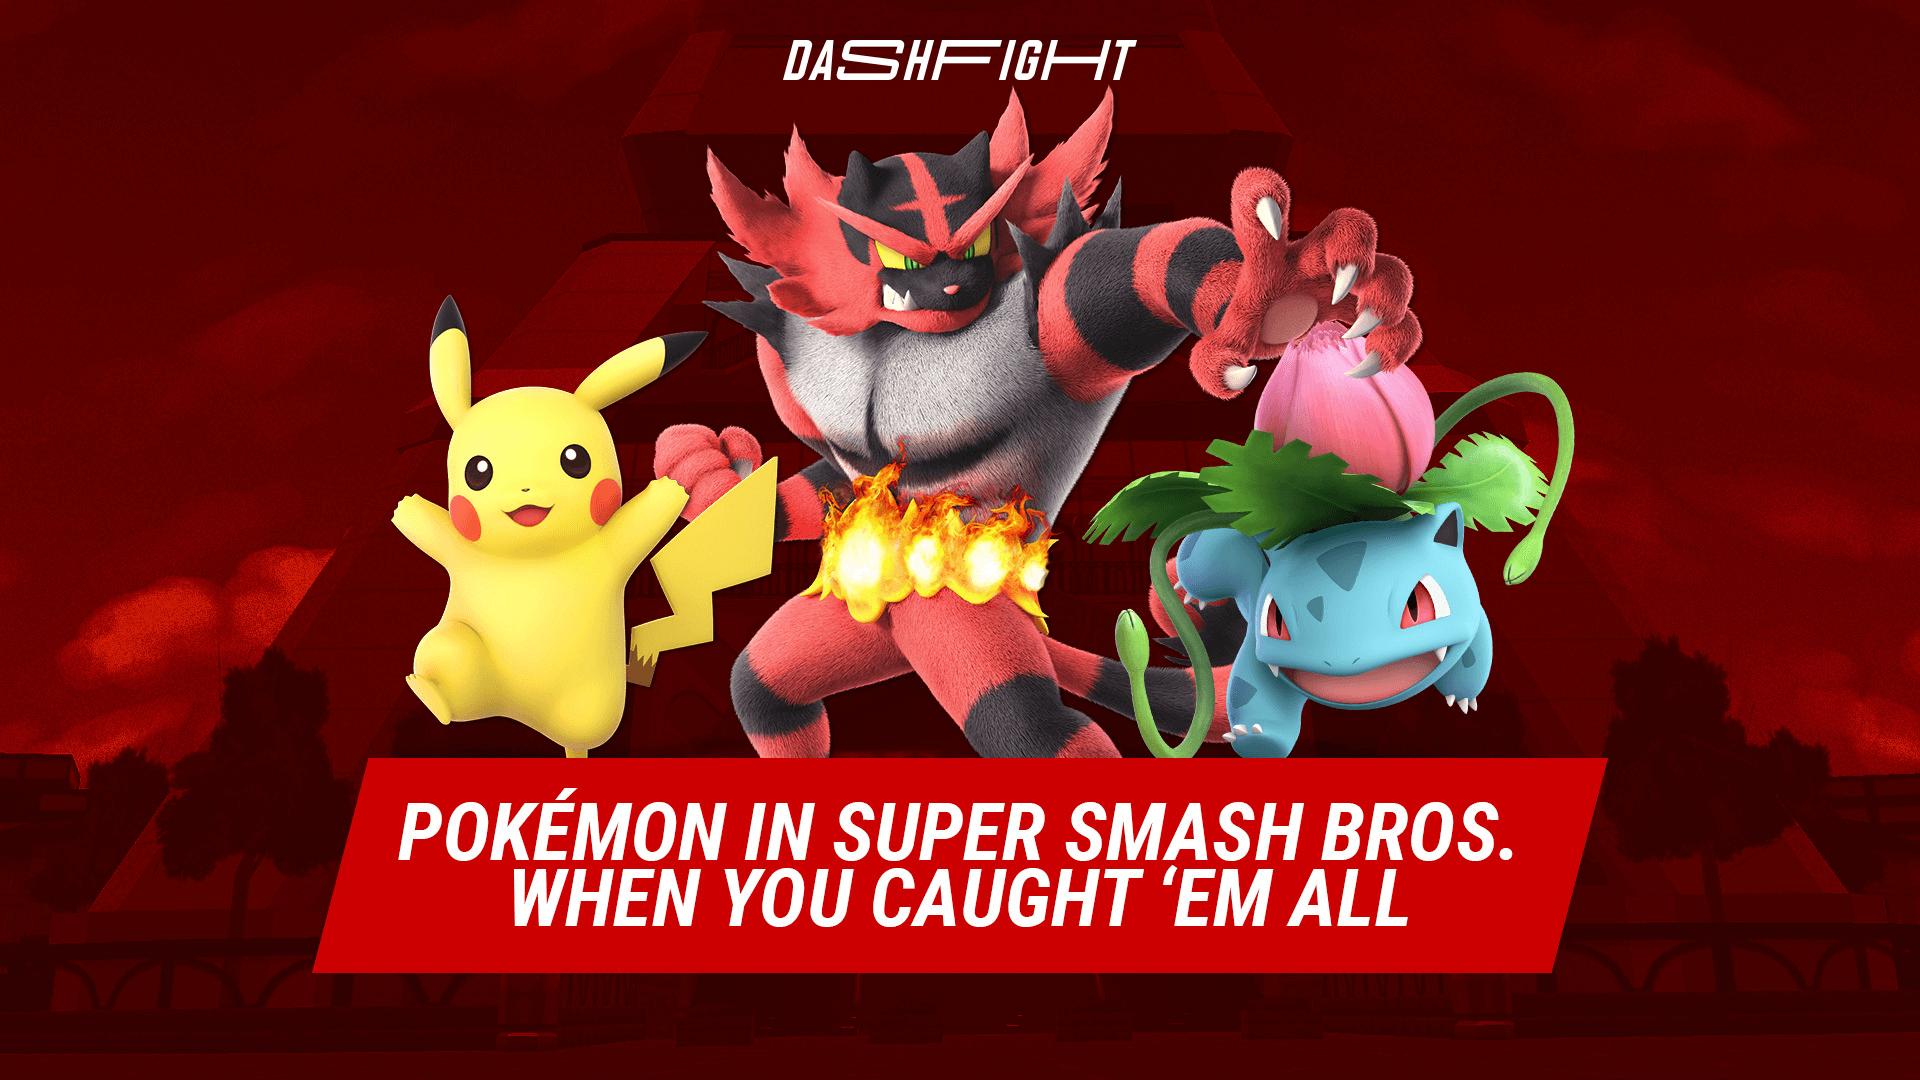 Pokémon in Super Smash Bros - When You Caught 'Em All